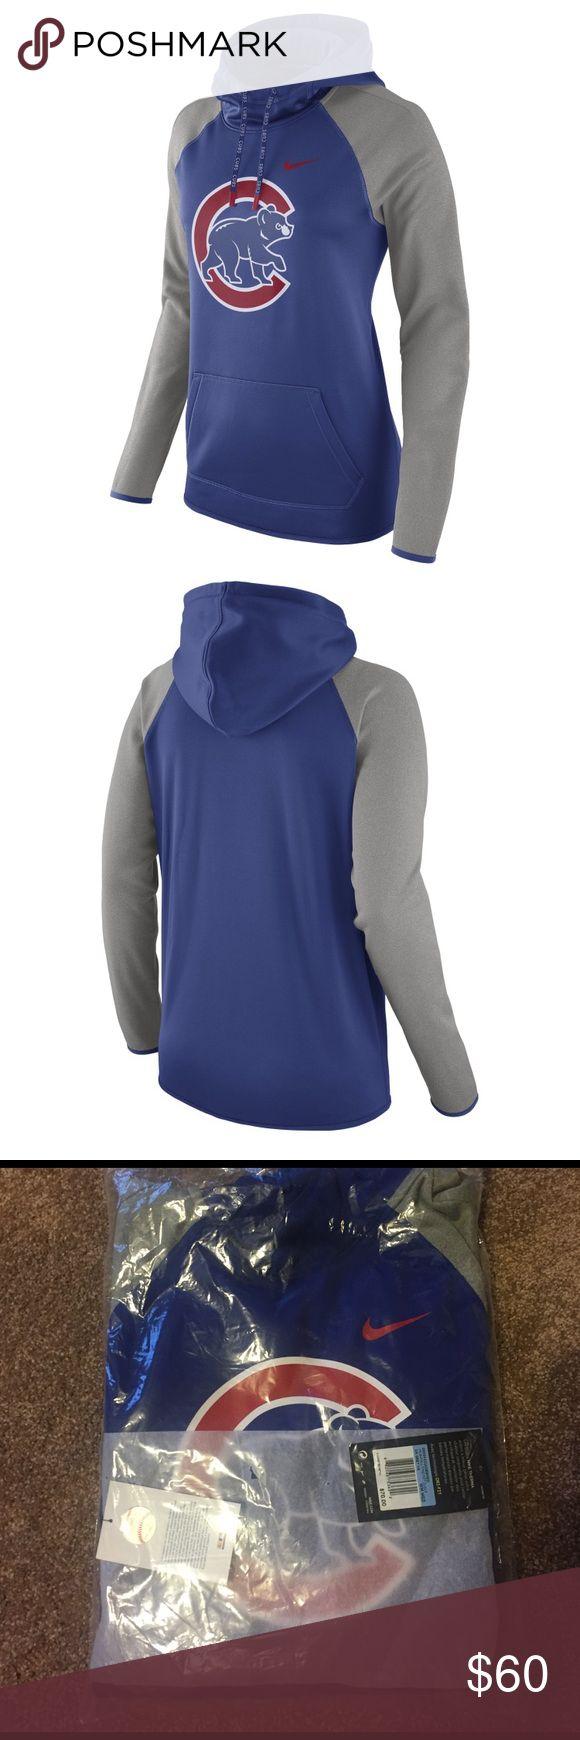 NWT! Chicago Cubs! Nike therma hoodie! Medium NWT! Chicago Cubs! Nike therma hoodie! Medium! Just in time for opening day!! Nike Tops Sweatshirts & Hoodies